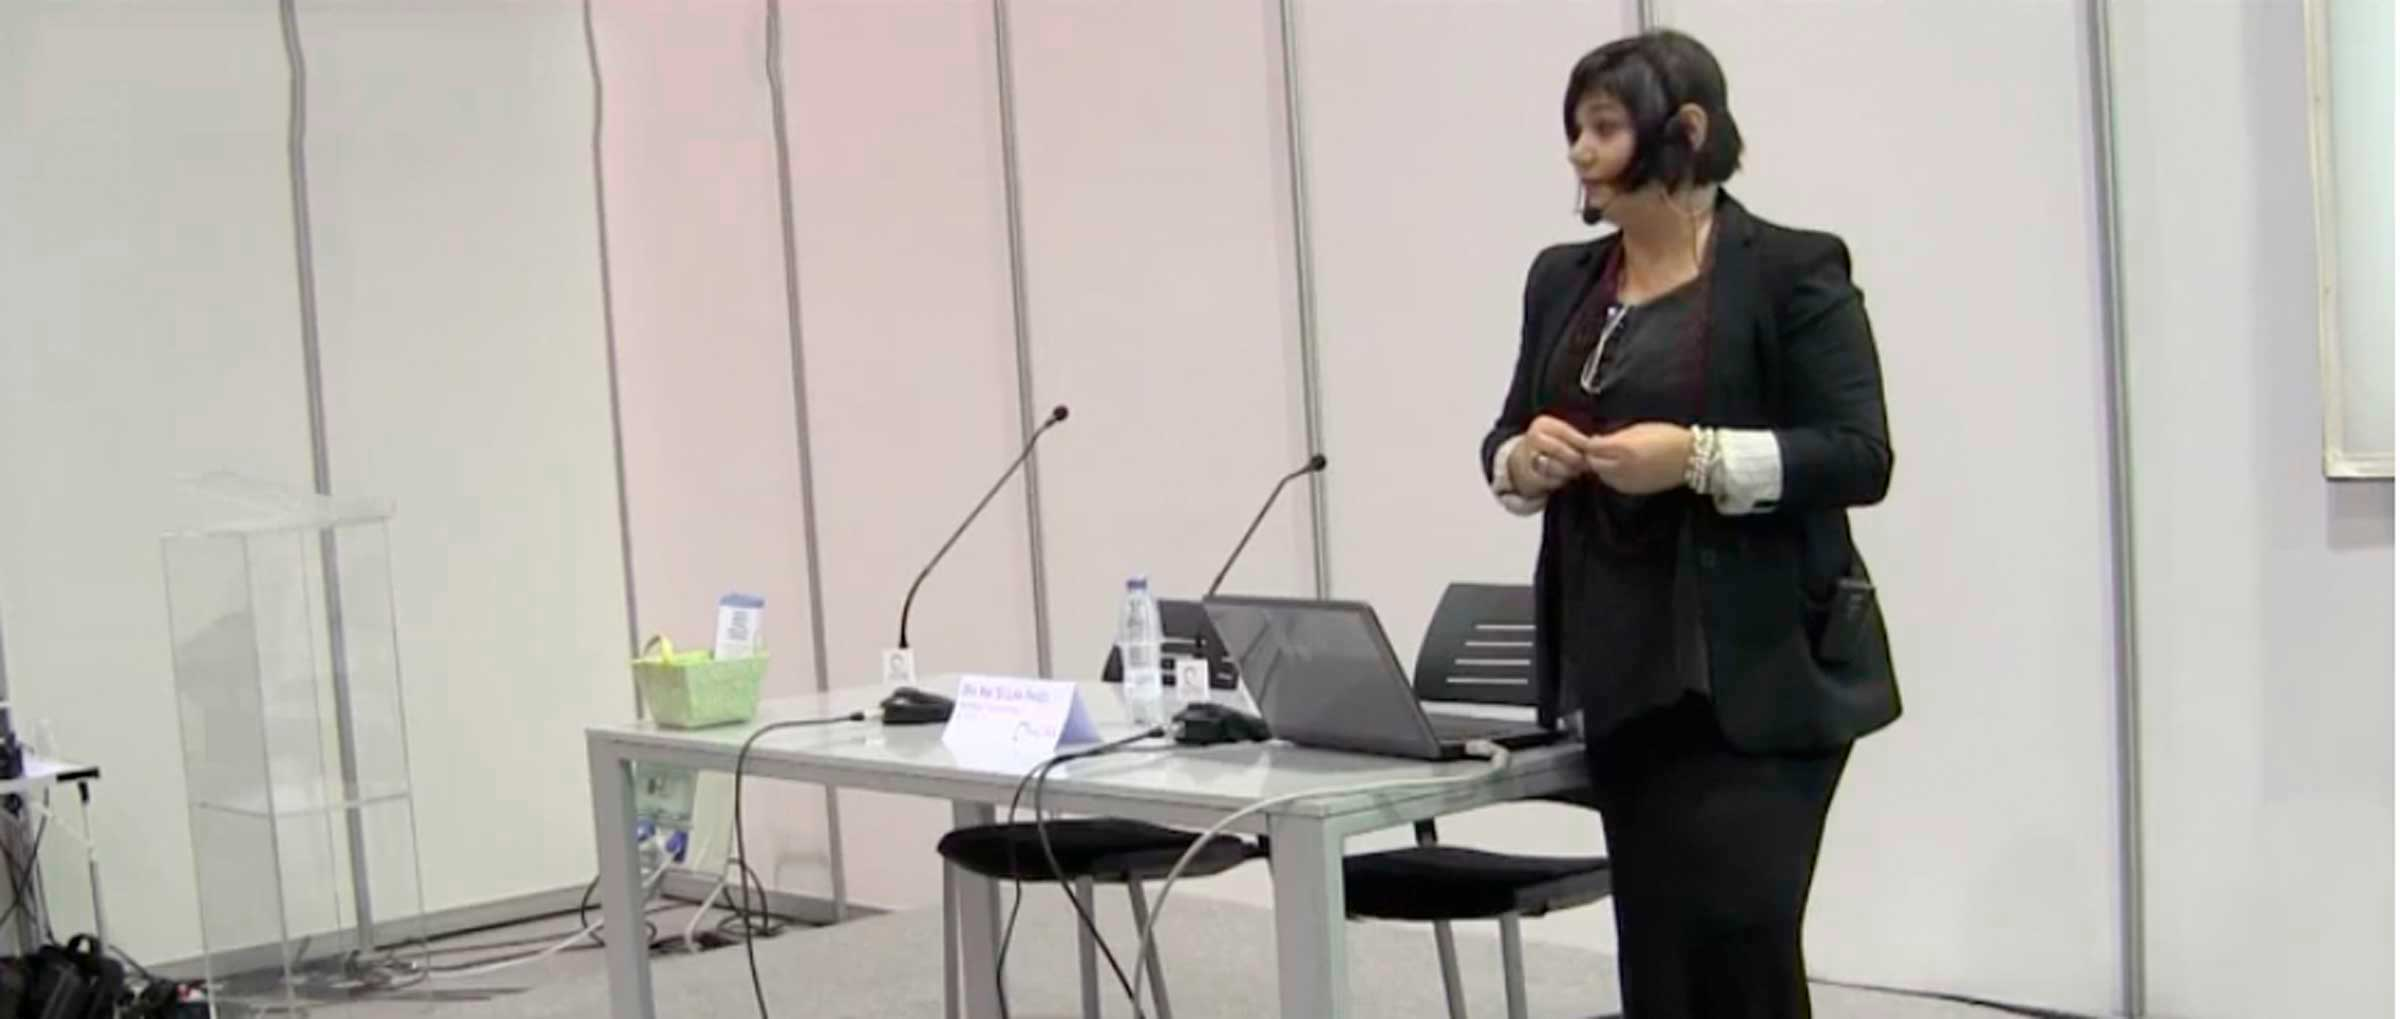 Speech of Dr Ana María Segura Paños